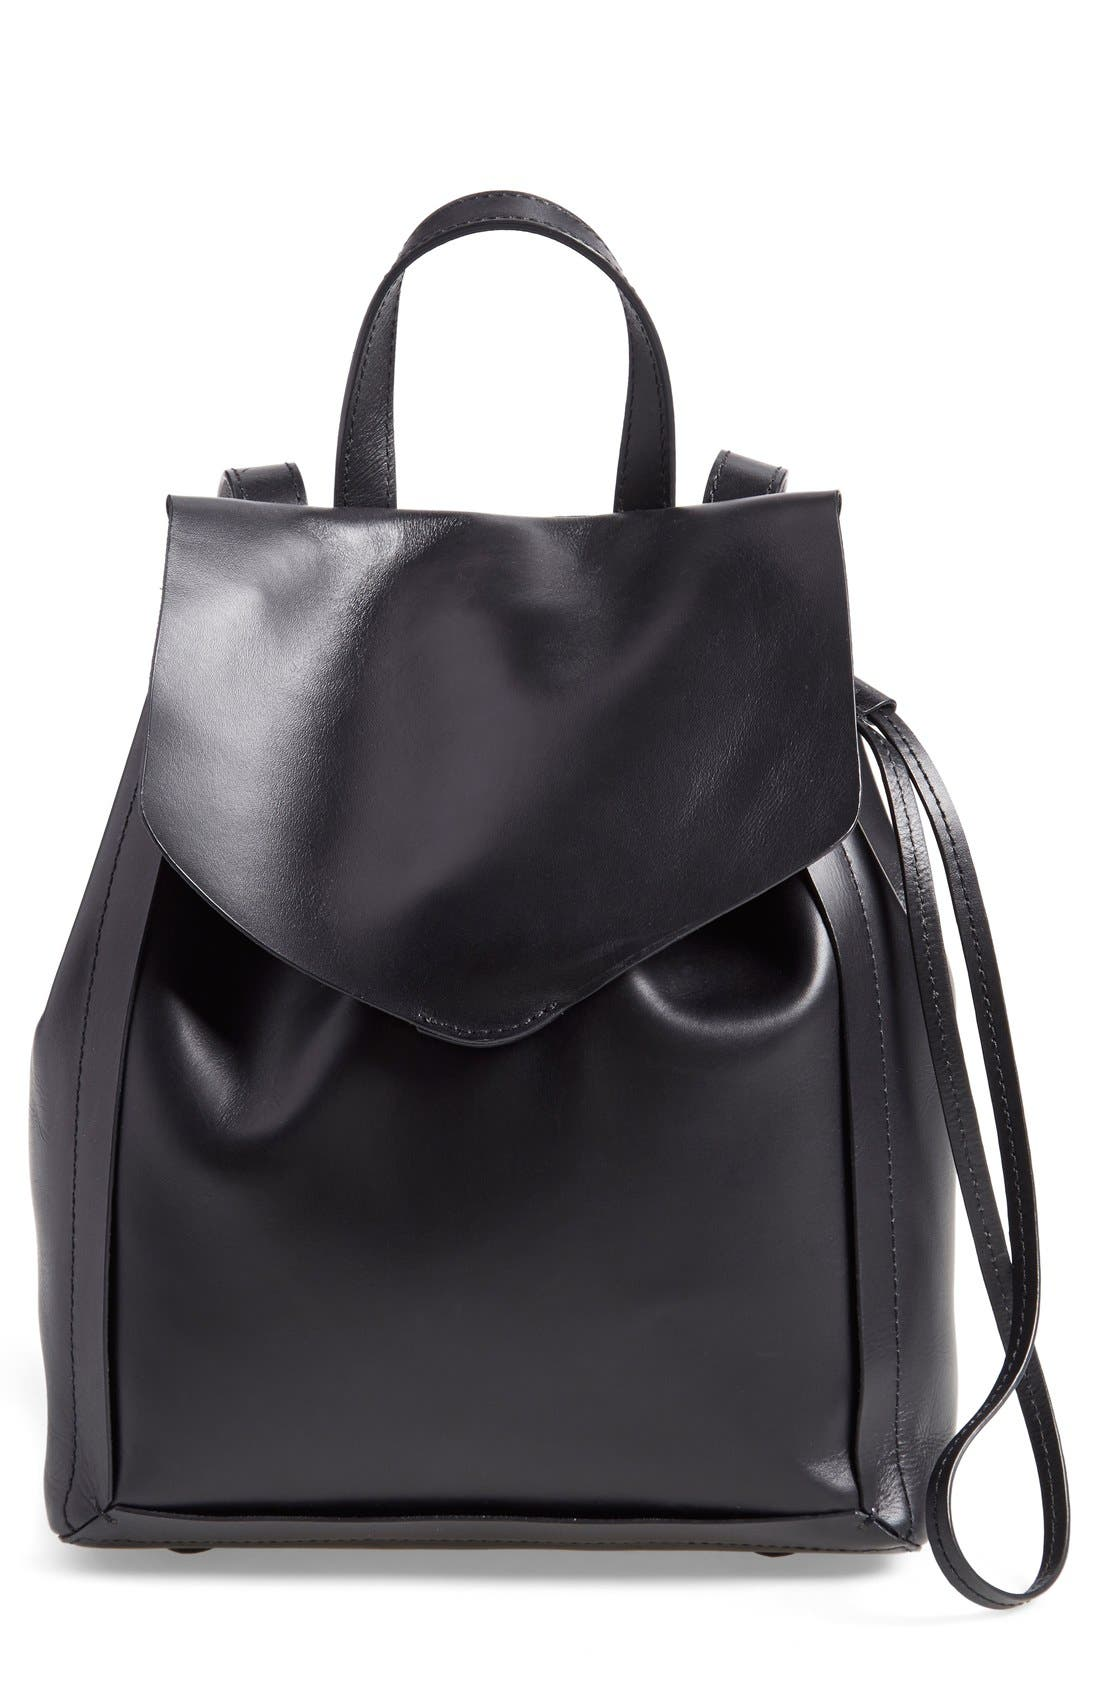 Main Image - Loeffler Randall 'Mini' Leather Backpack